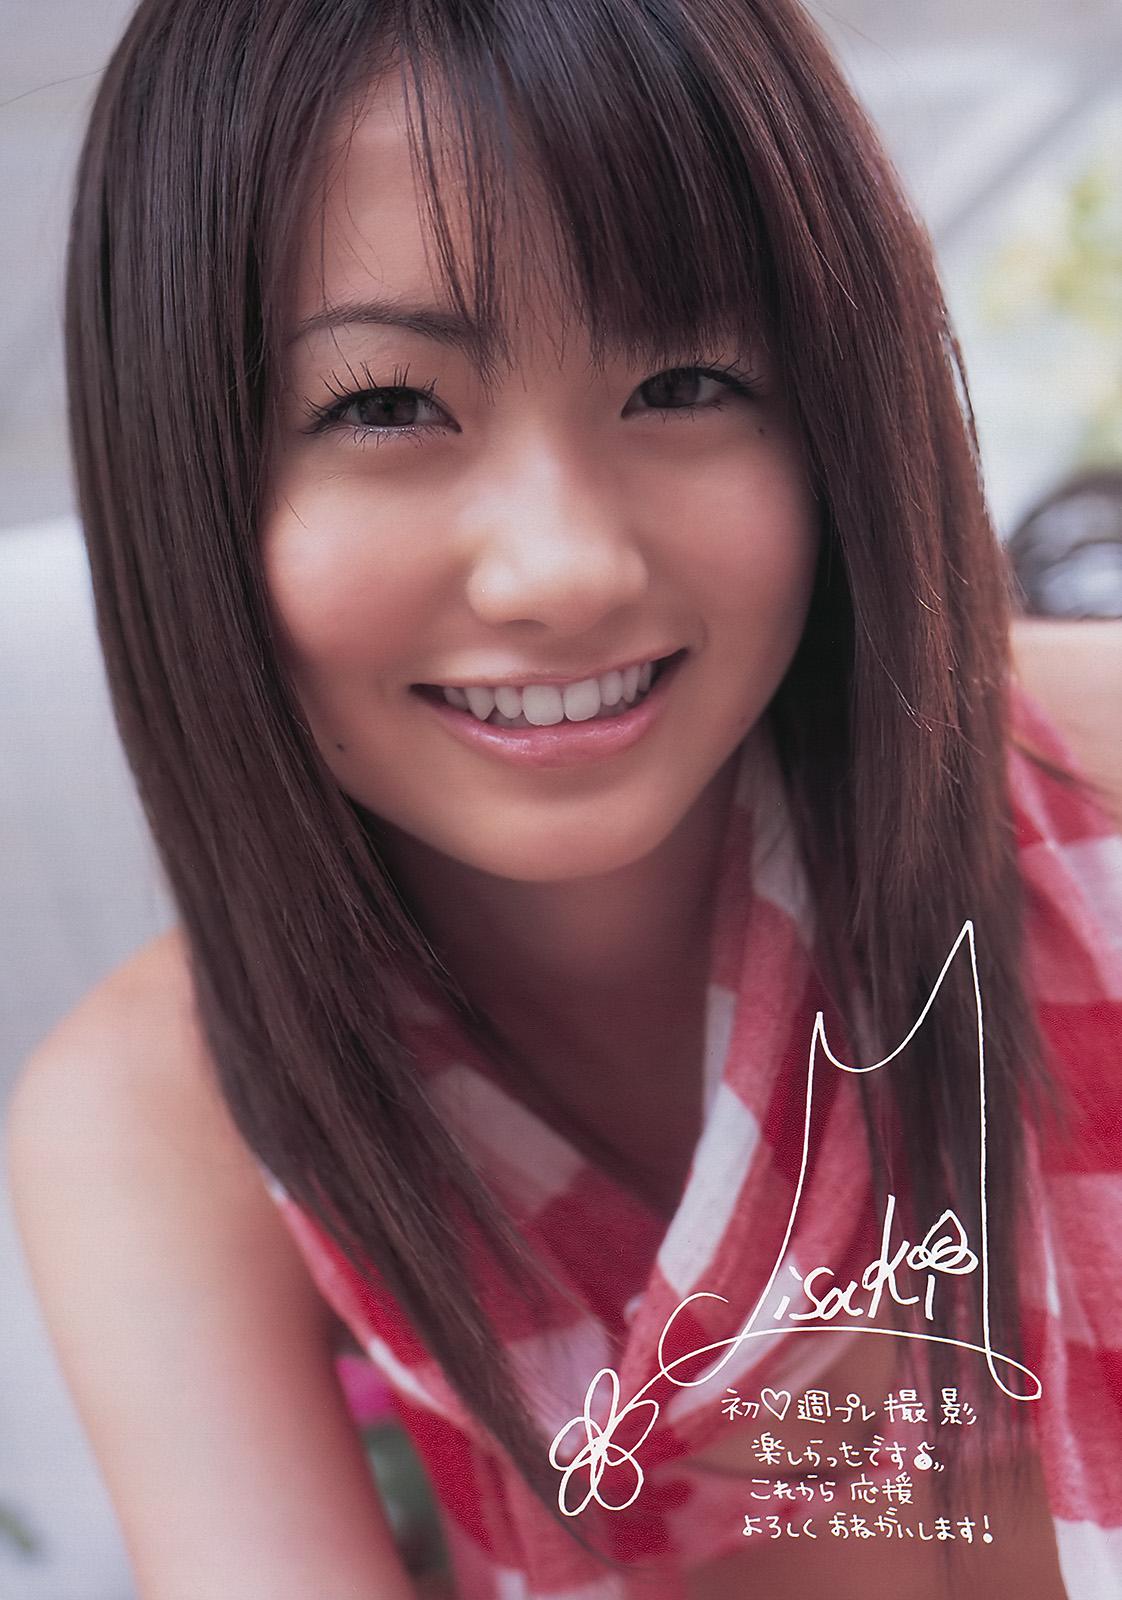 Misaki Momose - Cute Japanese Girl And Hot Girl Asia